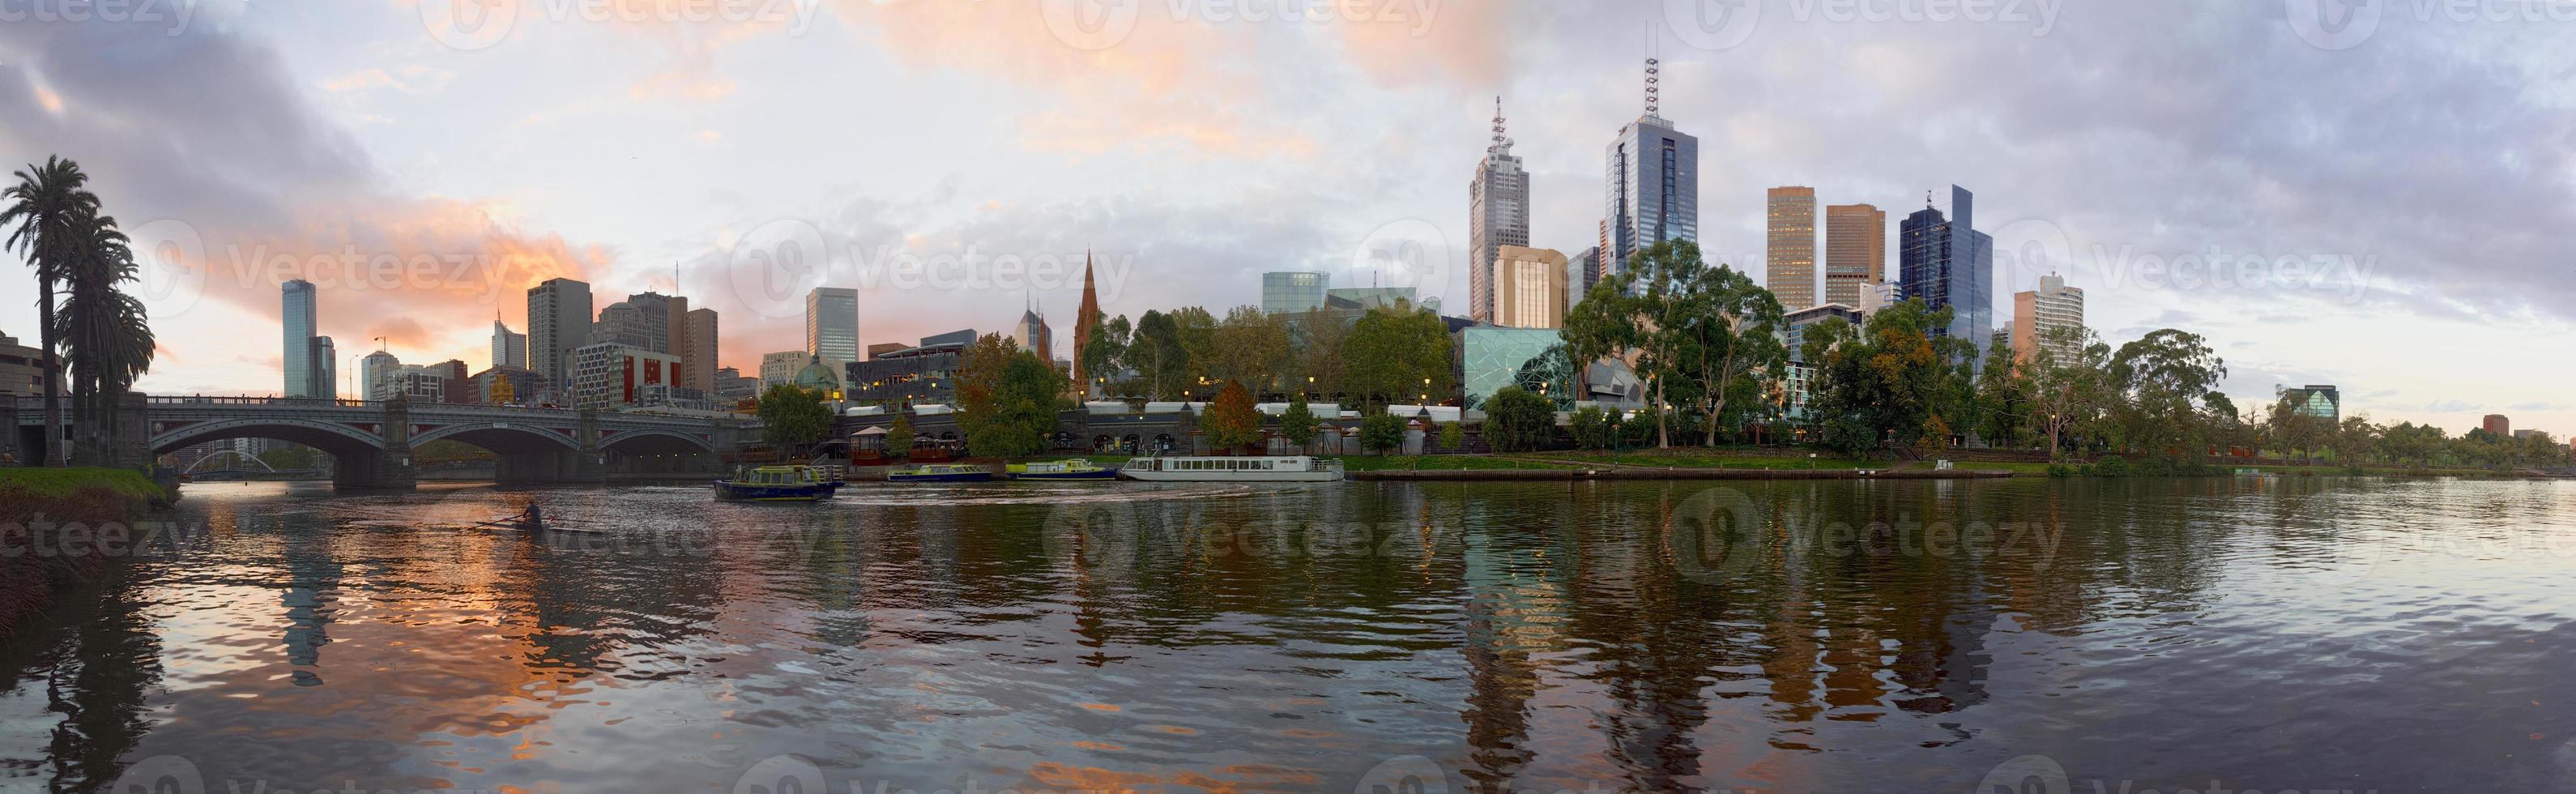 melbourne e o rio yarra foto